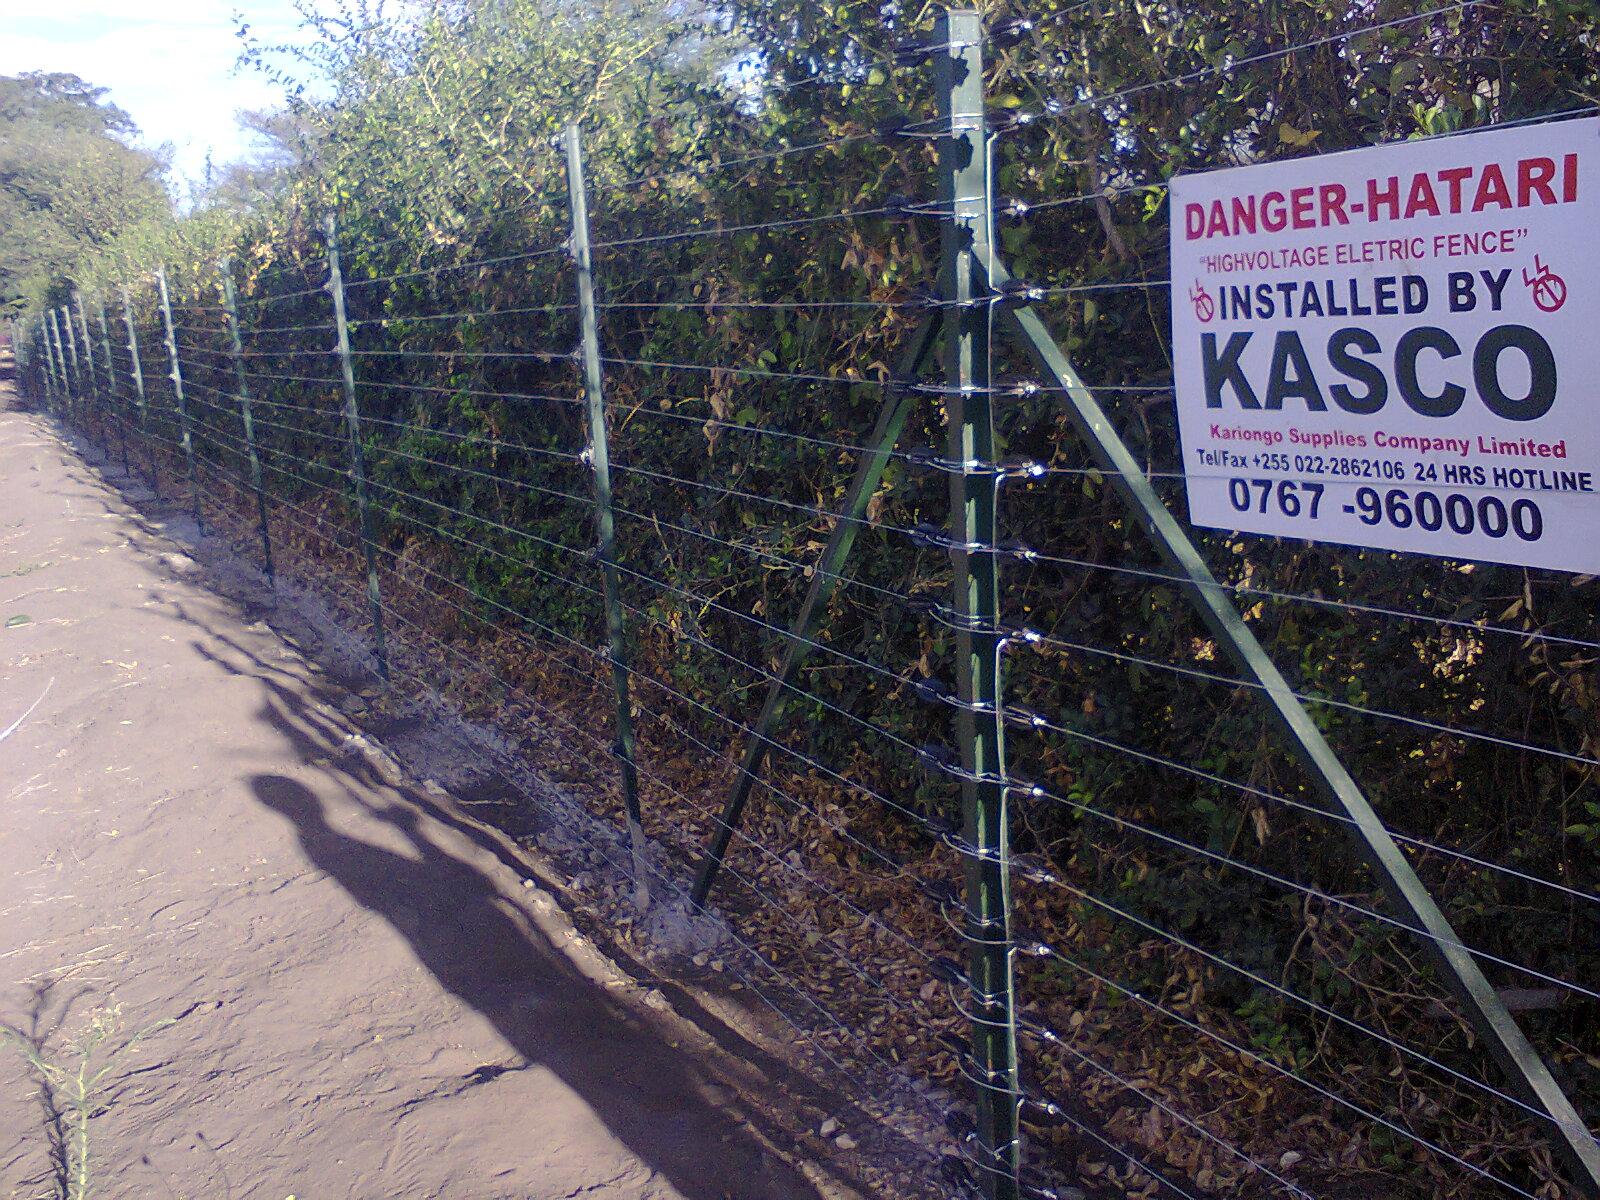 KARIONGO SUPPLIES CO LTD (KASCO): July 2012